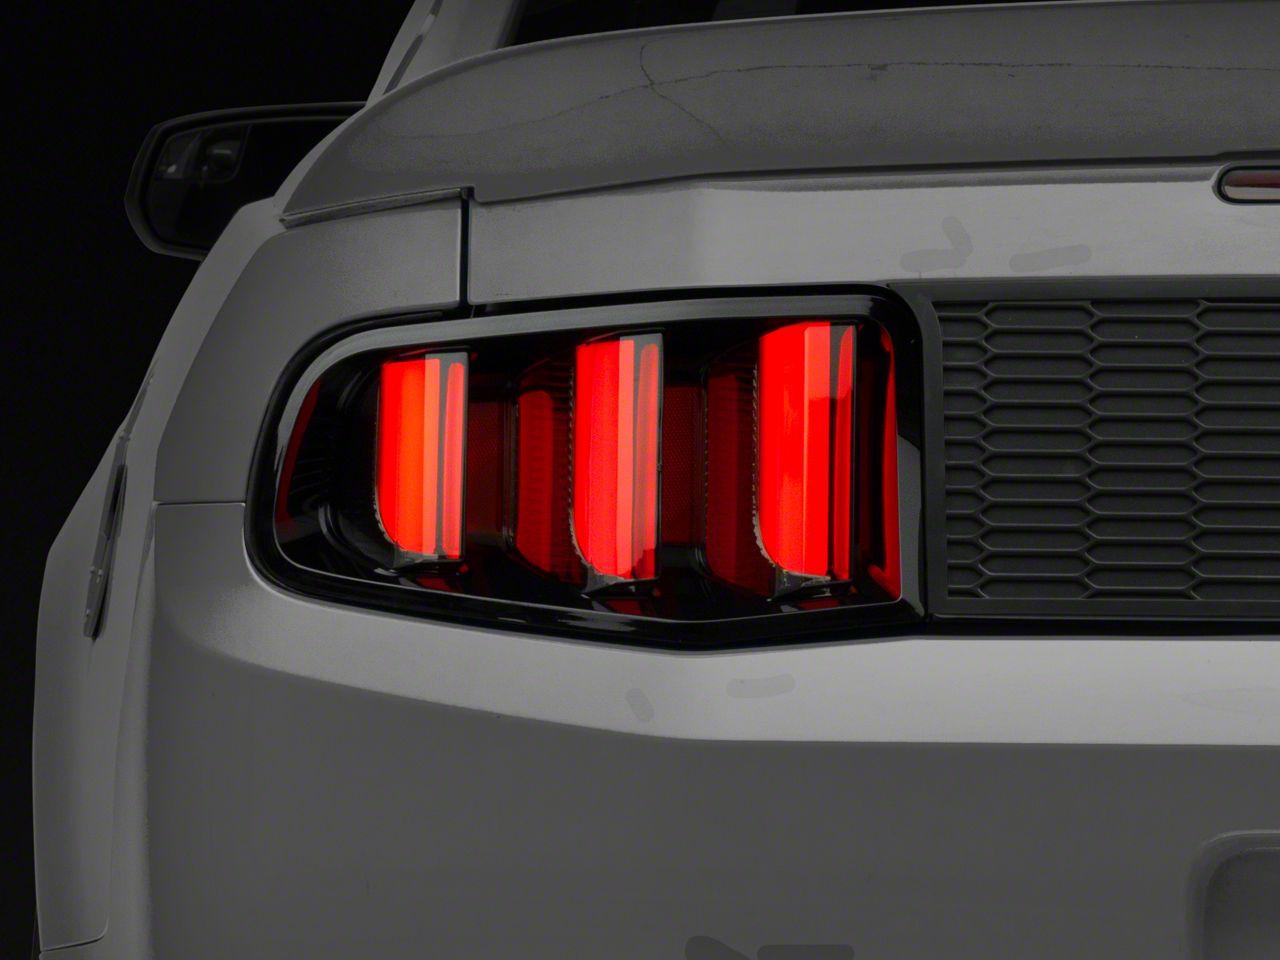 Raxiom Vector V2 LED Tail Lights (10-12 All)